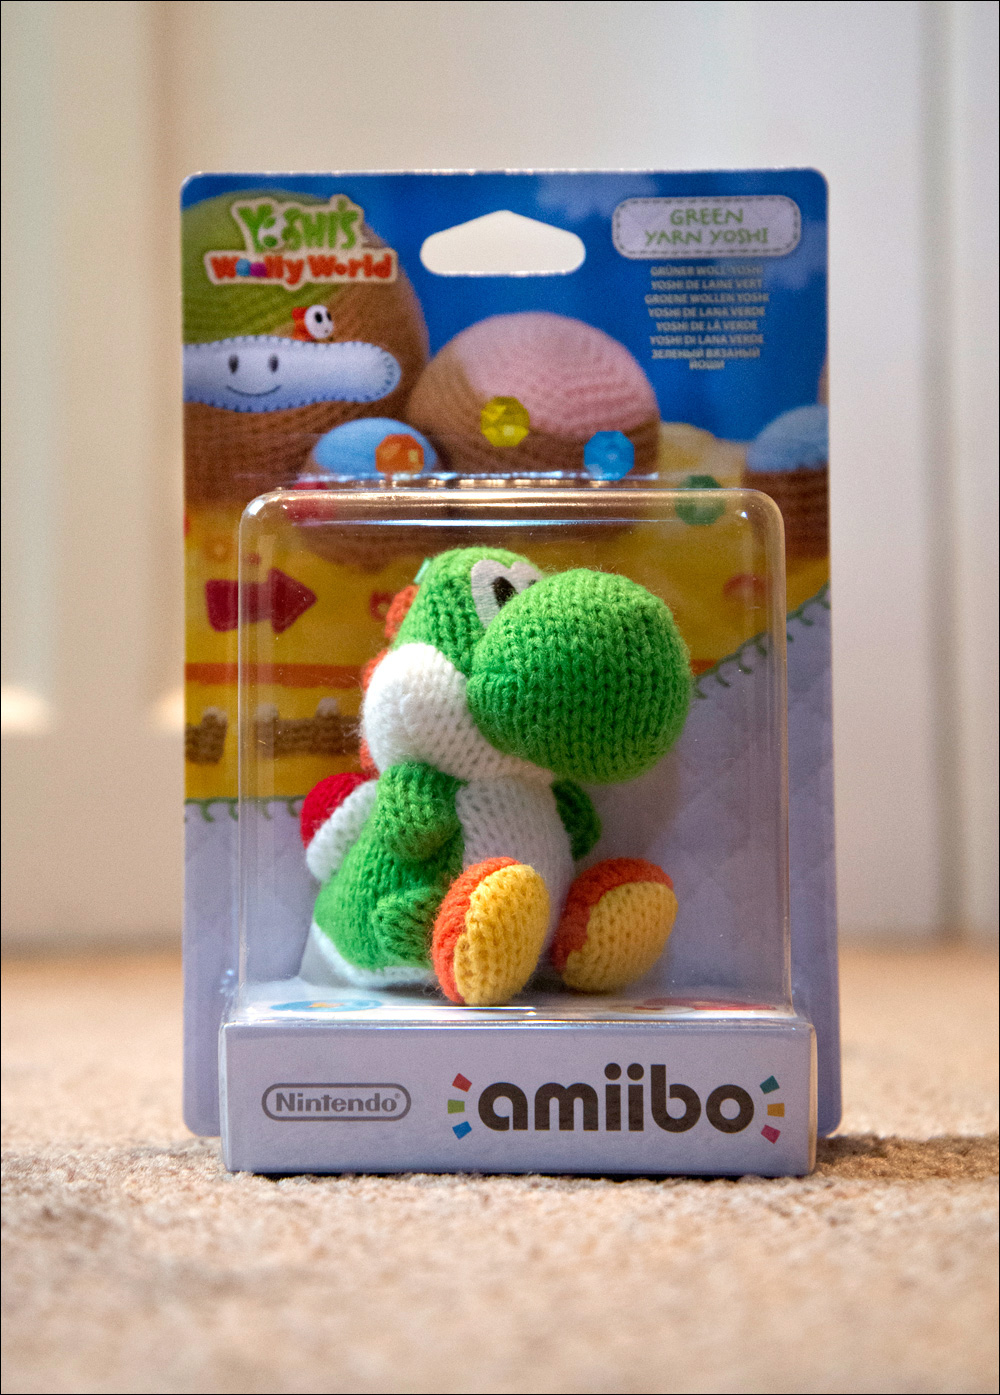 Yoshi's-Woolly-World-Green-Yoshi-Amiibo